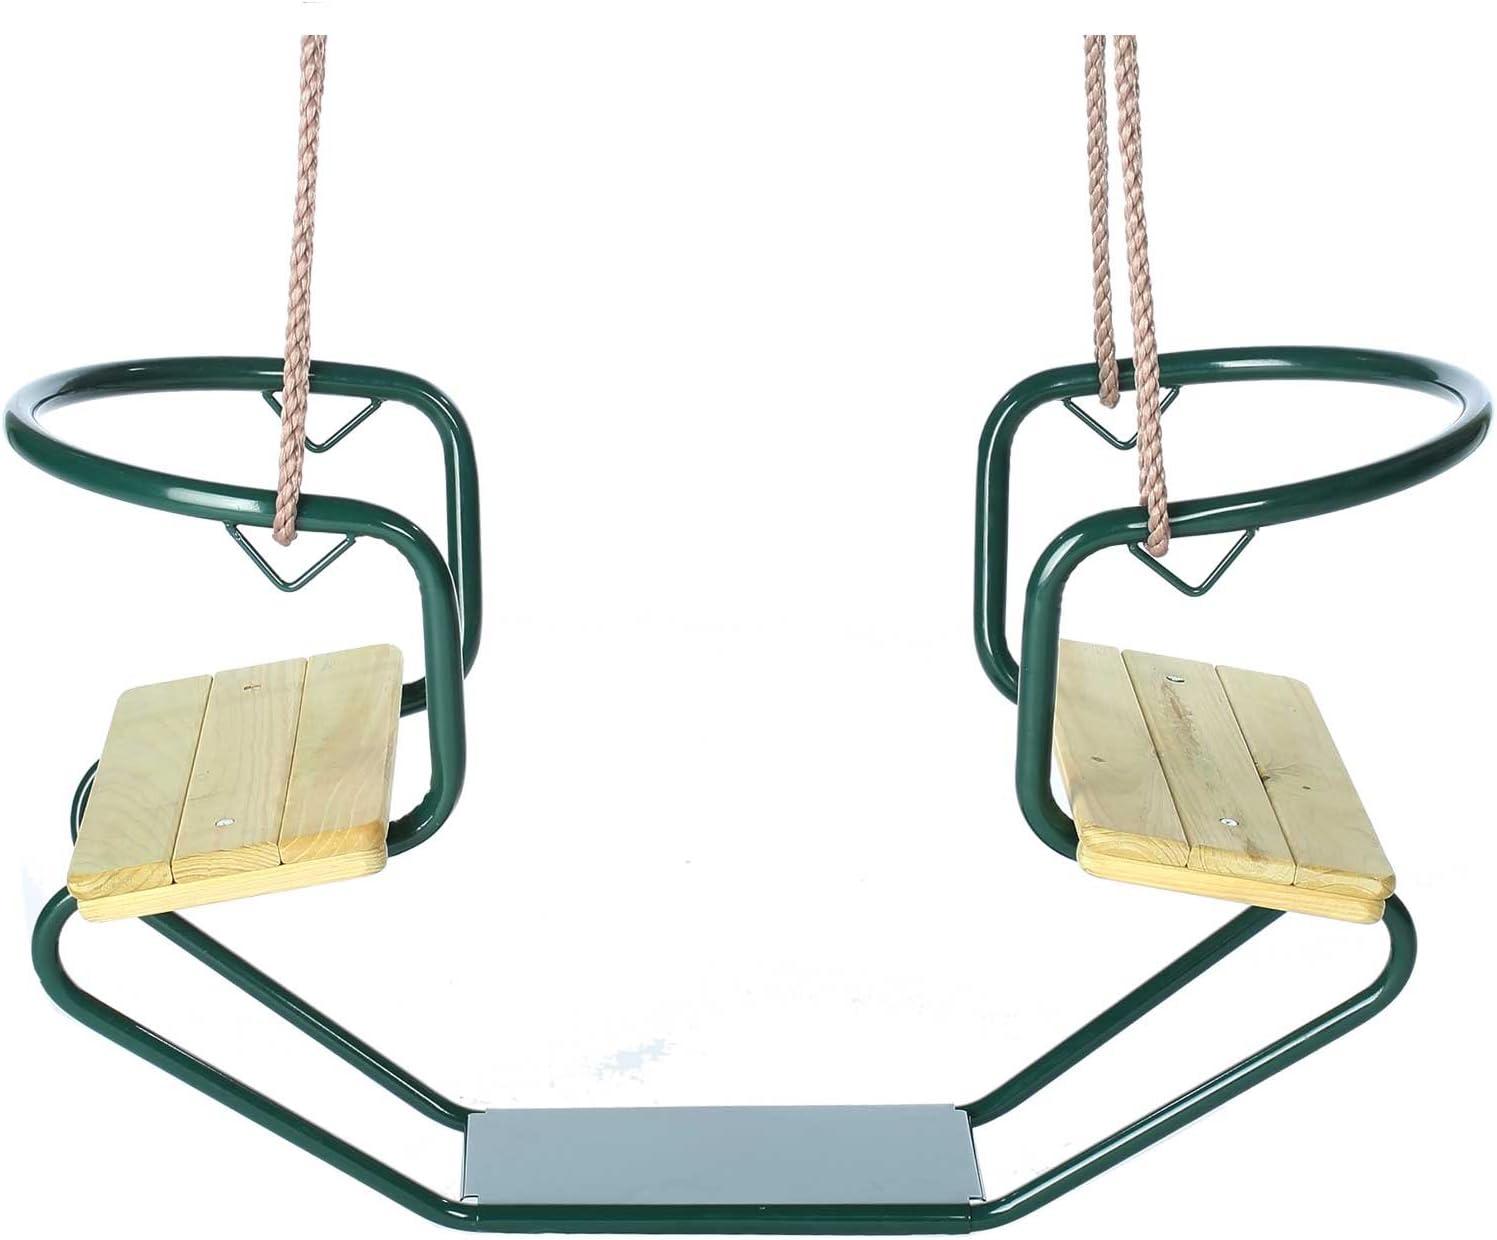 Columpio Infantil Doble góndola, Metal, Verde, Exterior